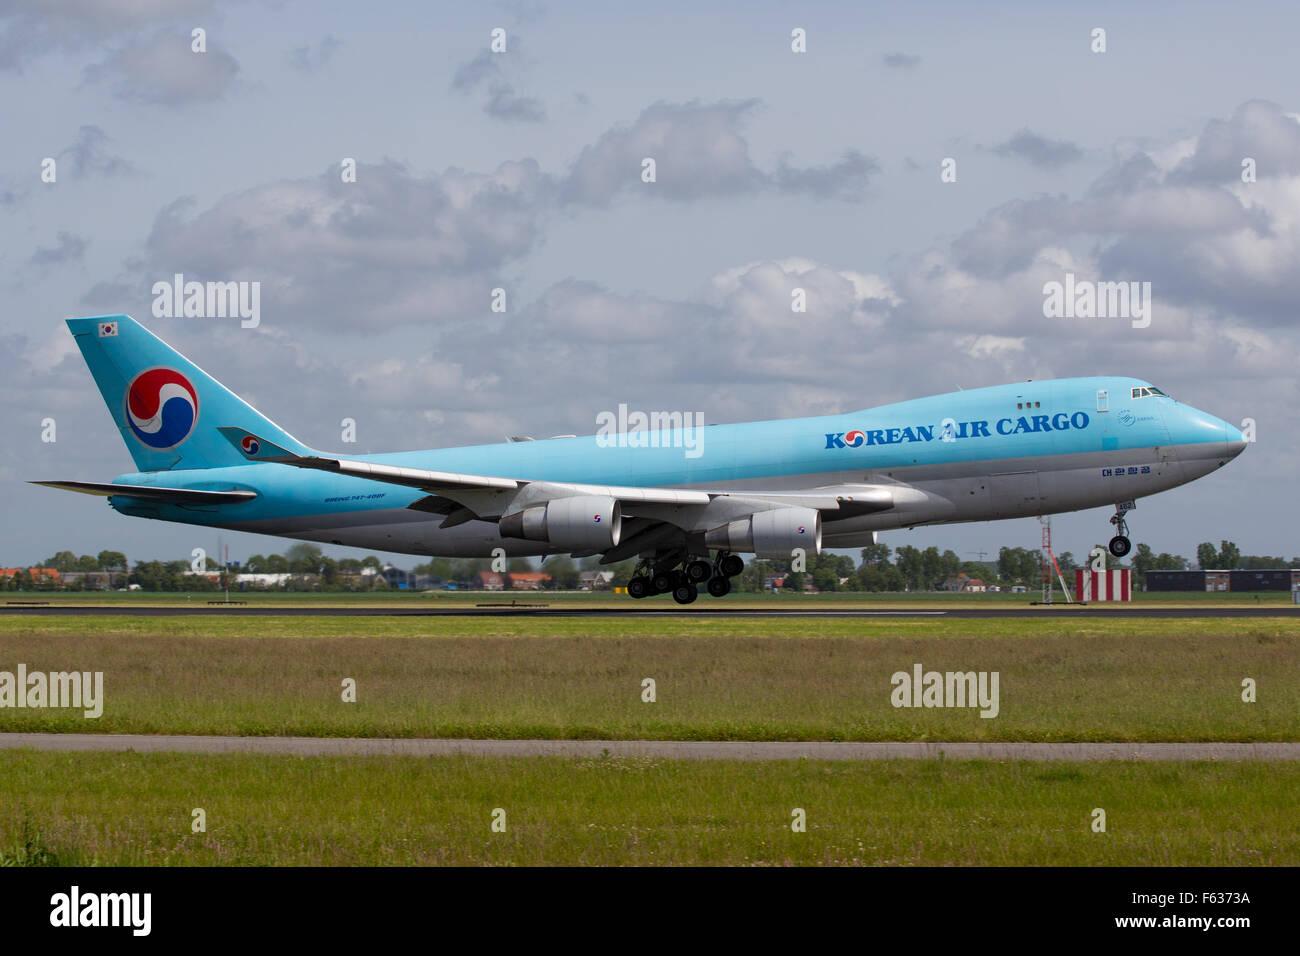 Korean Air Cargo Boeing 747 - Stock Image